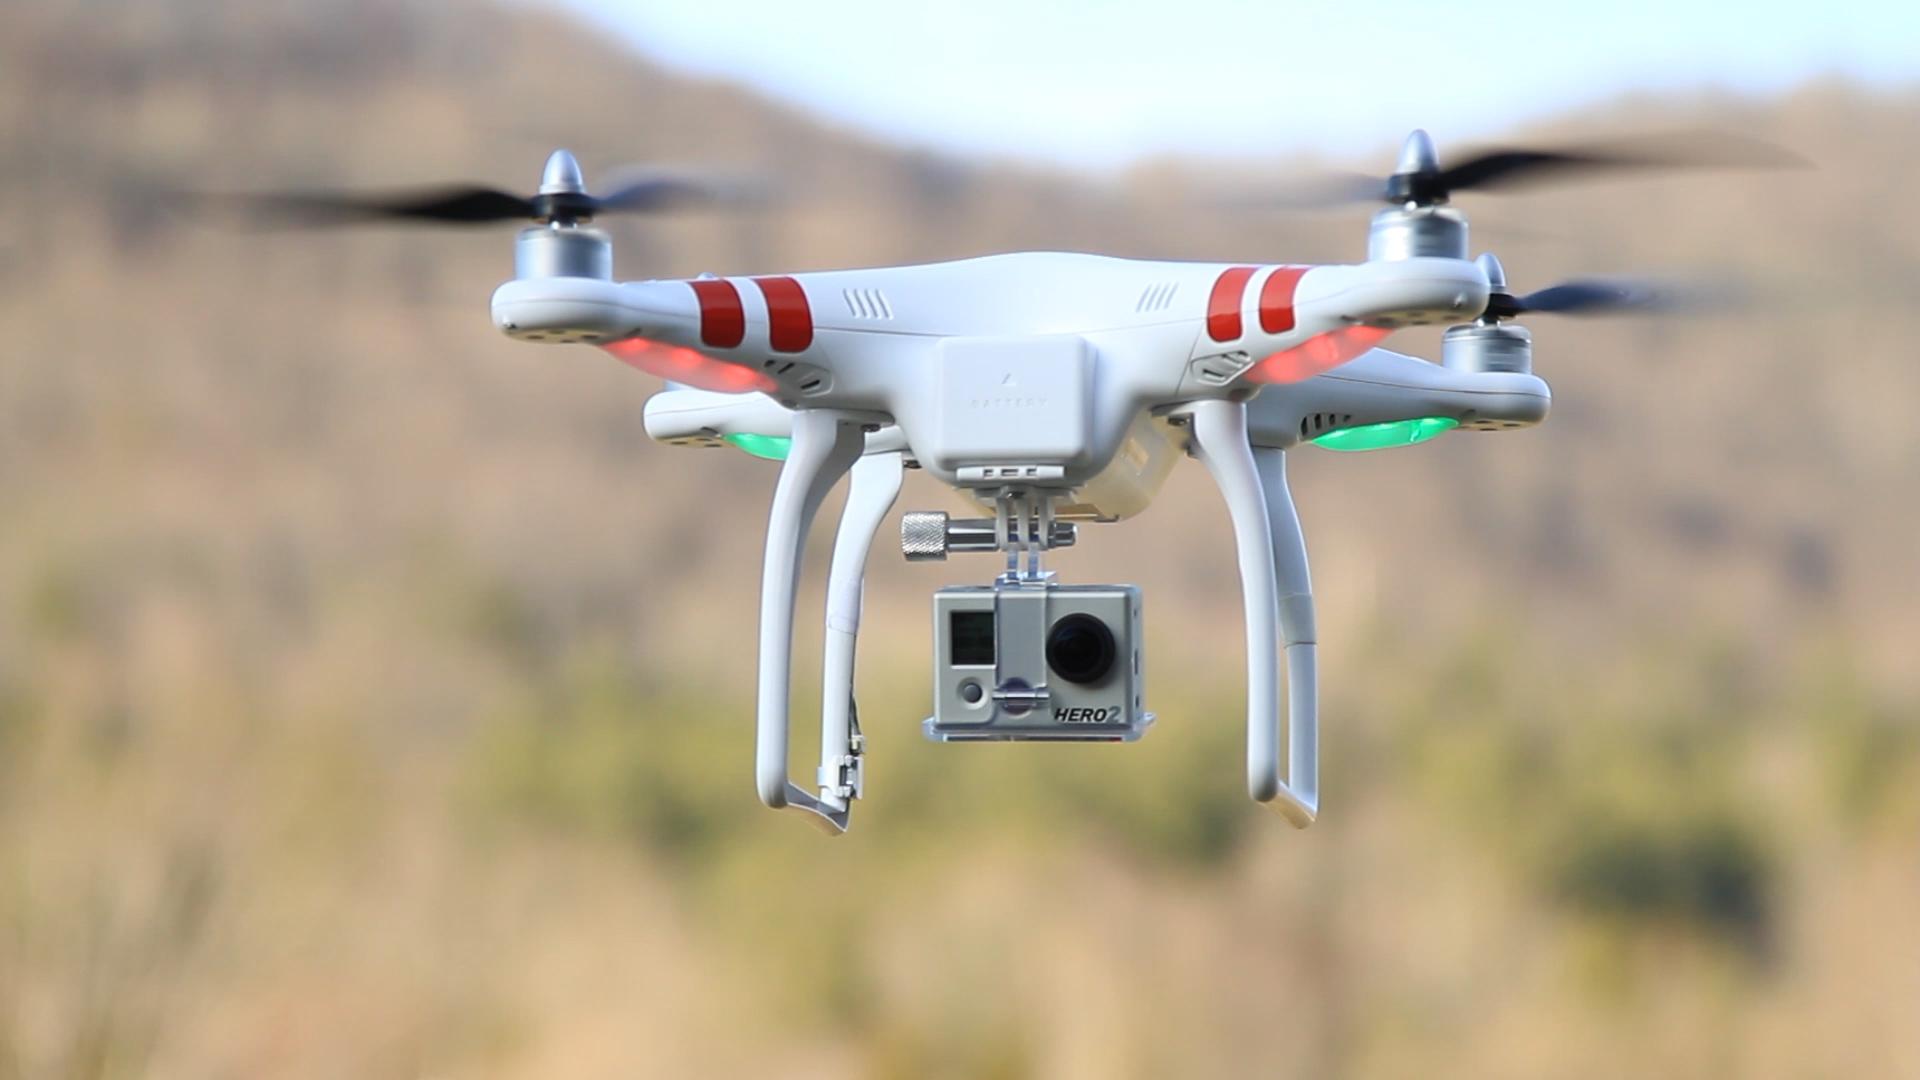 DJI Phantom 2 – The Best GoPro Quadcopter? - TheBestDronesHQ.com